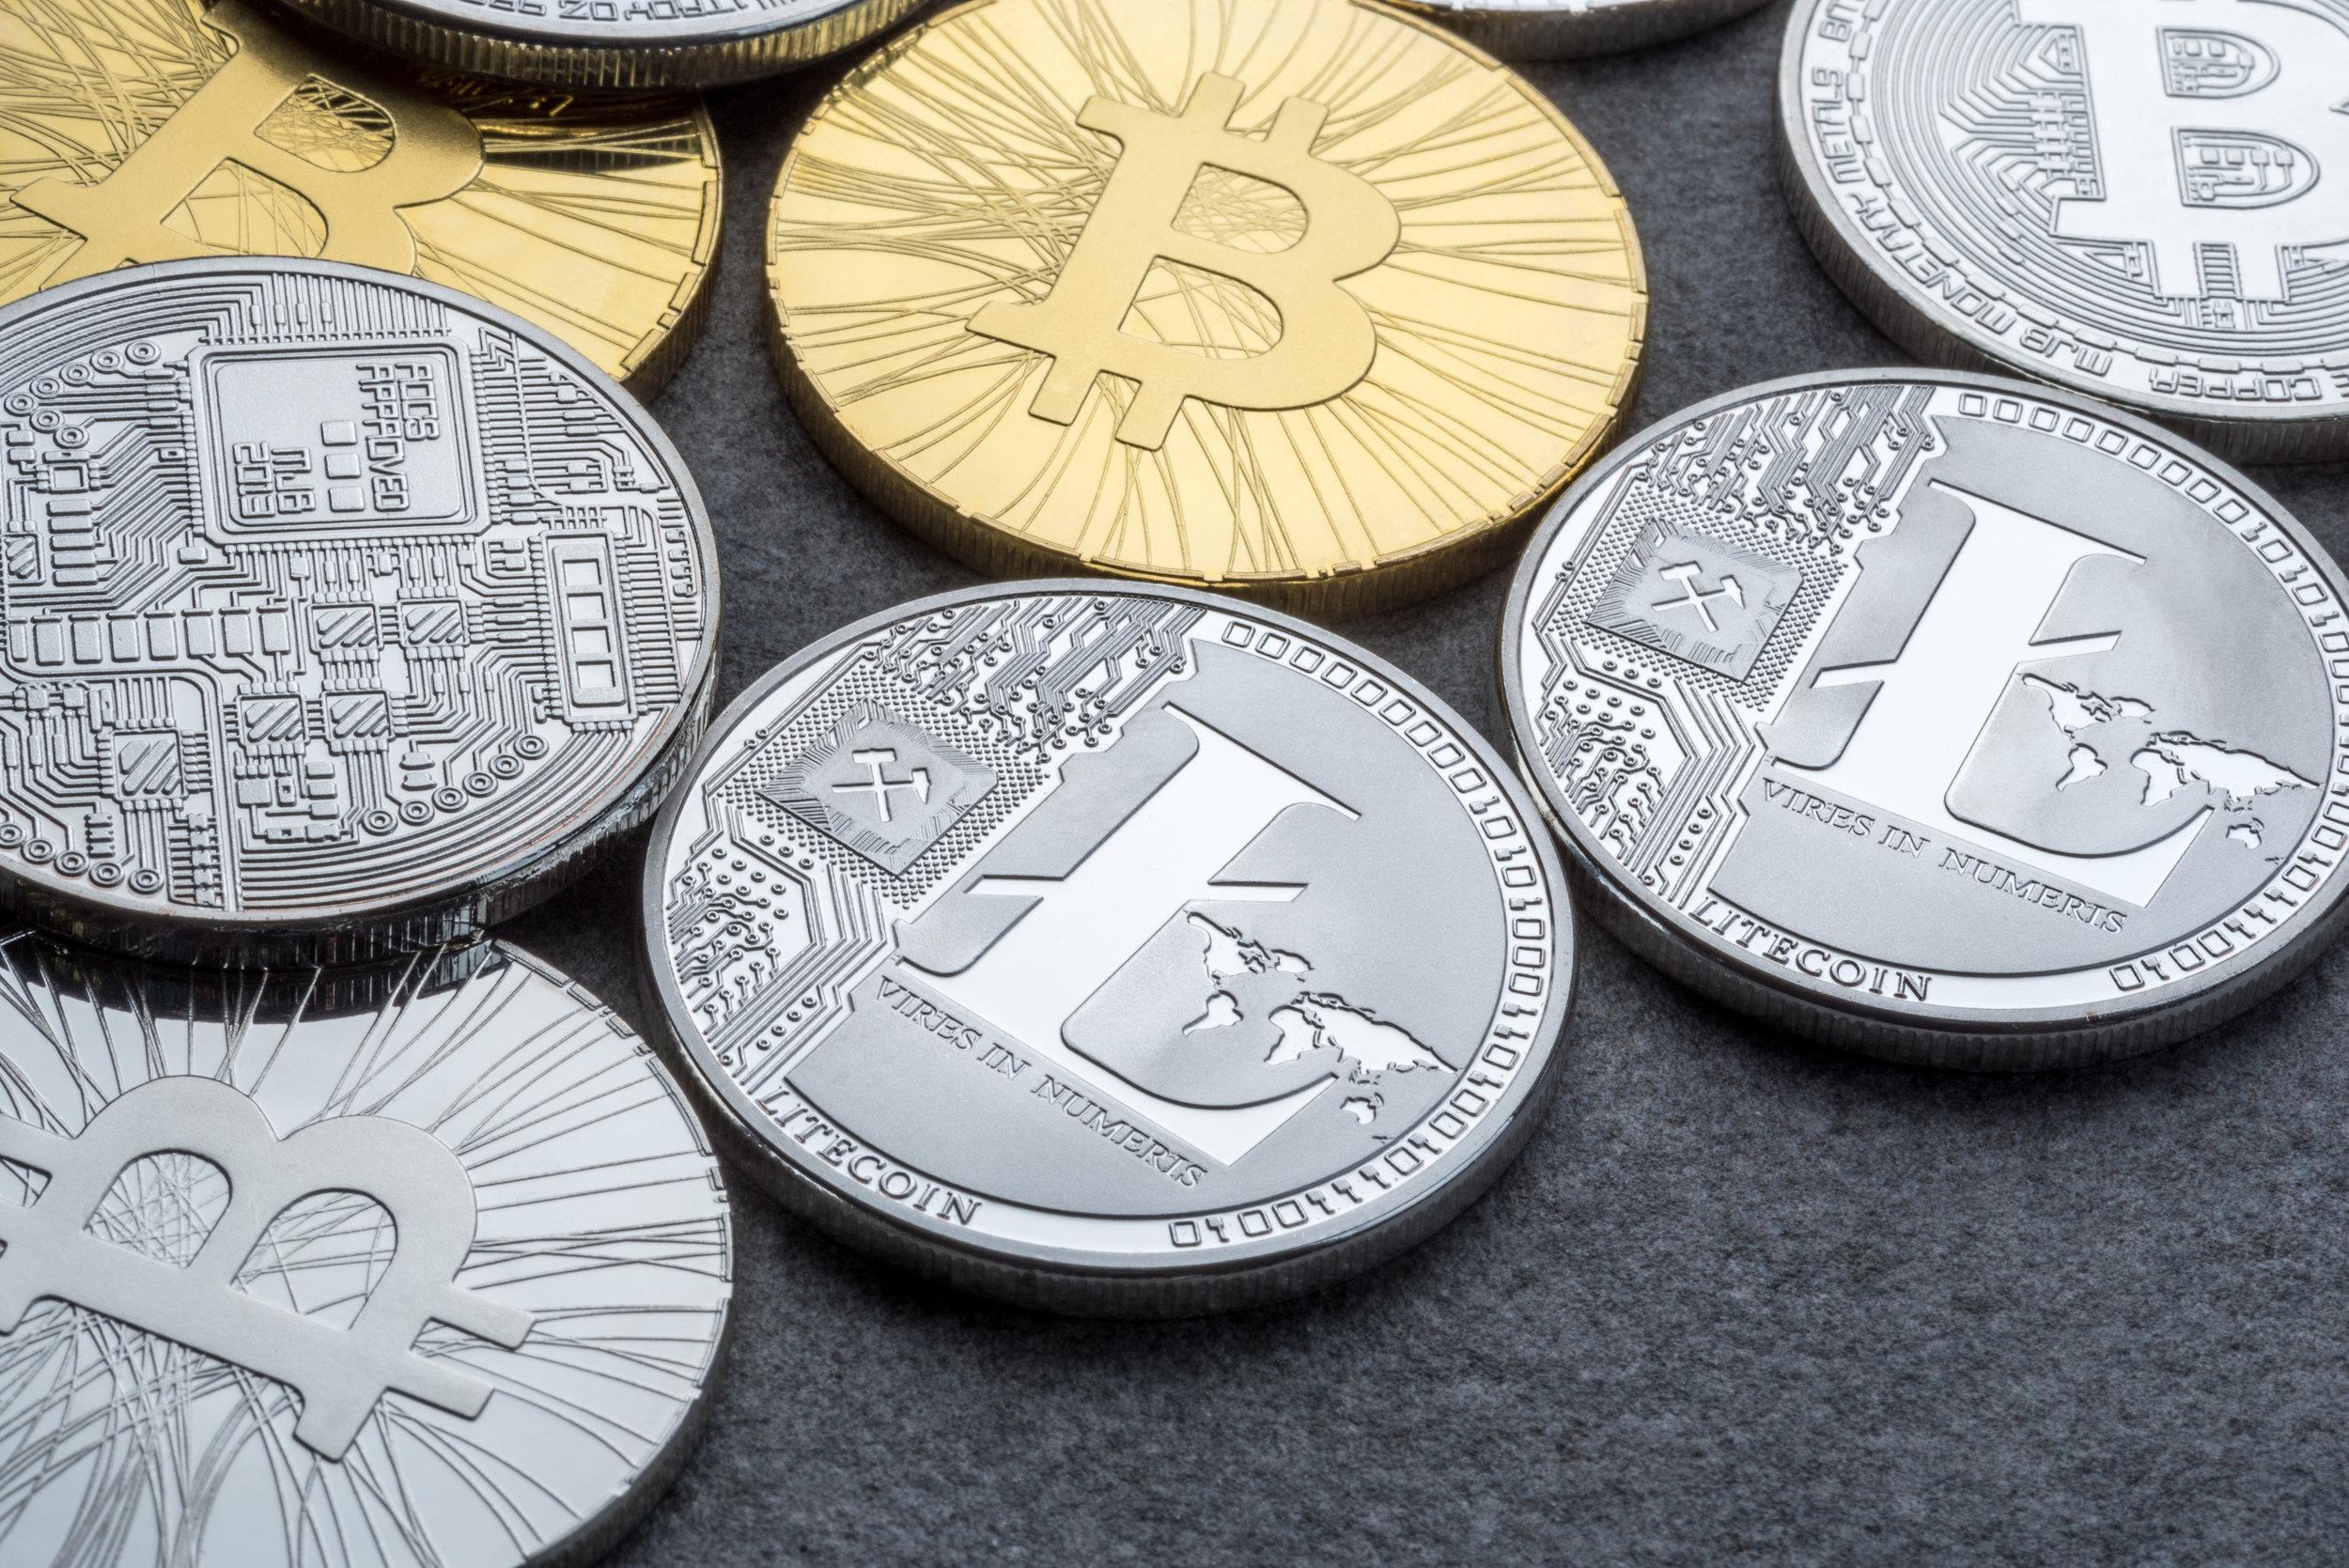 """Development of the Crypto Market - Bitcoin & Litecoin"" Source: © bychykhin, Adobe Stock - FILE #:    184933613"